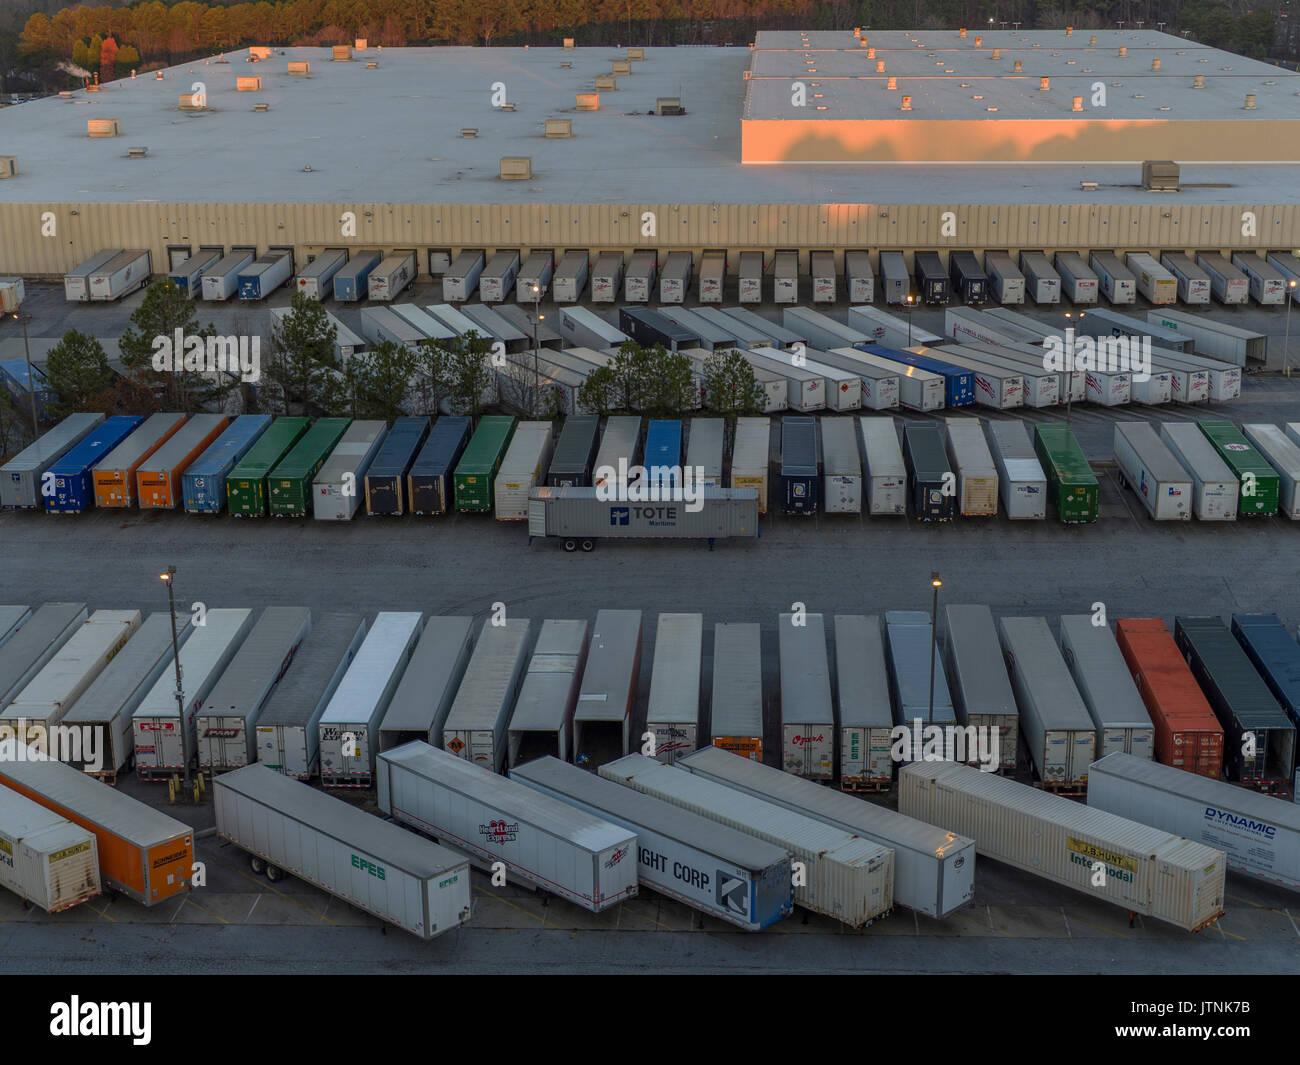 Marshall's Warehouse, Decatur, Georgia. Drone image - Stock Image